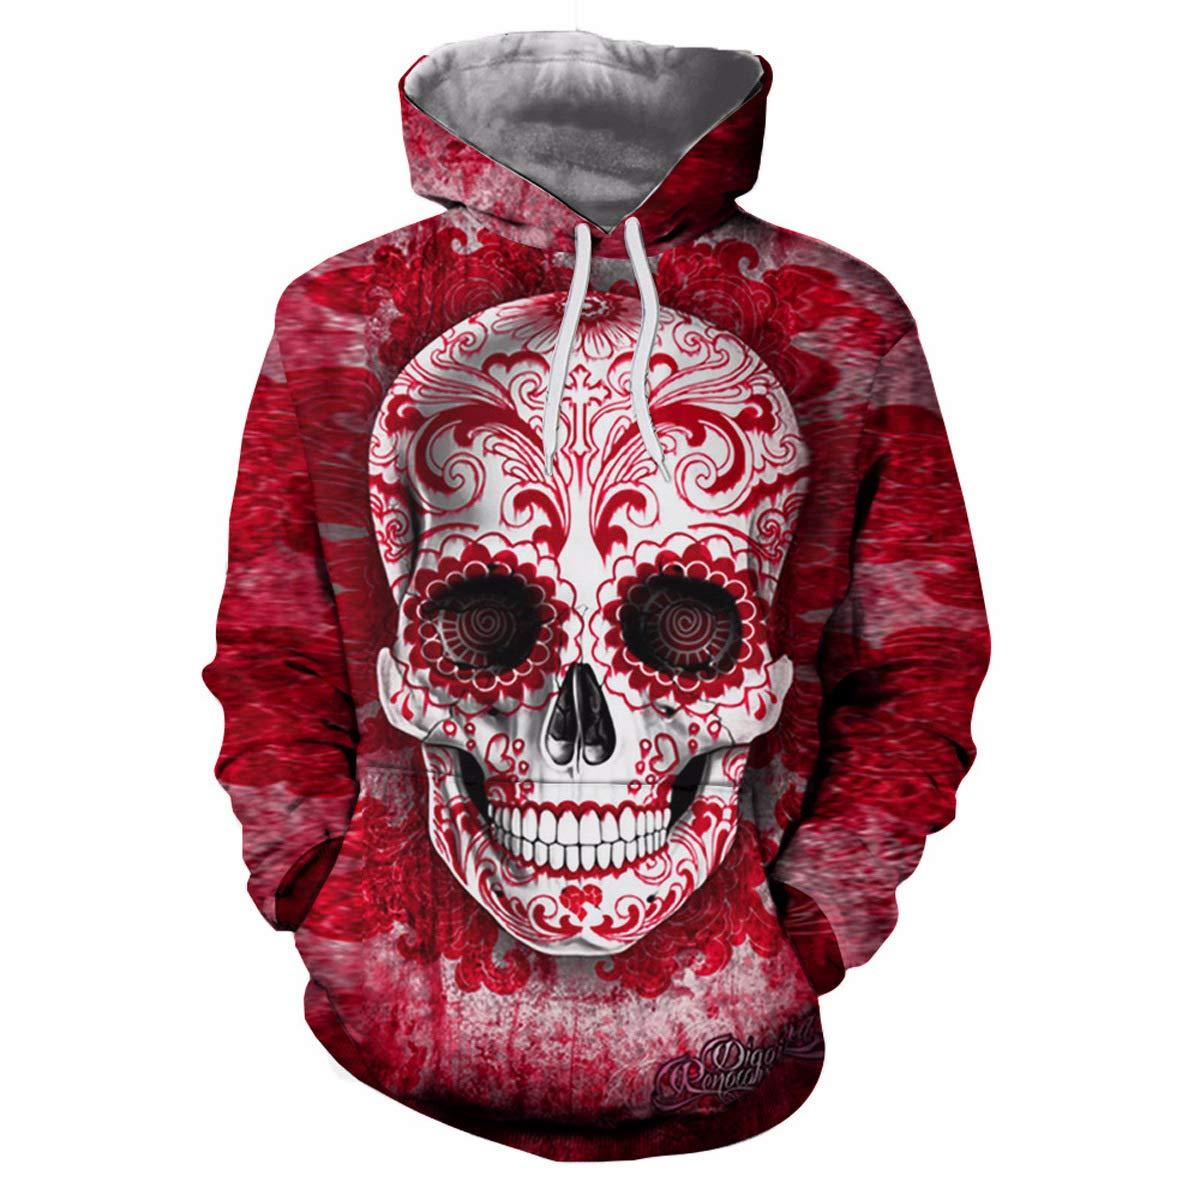 Ninmon Shares 3D Hoodied Skulls Printed for Women Sweatshirt Halloween Pullover